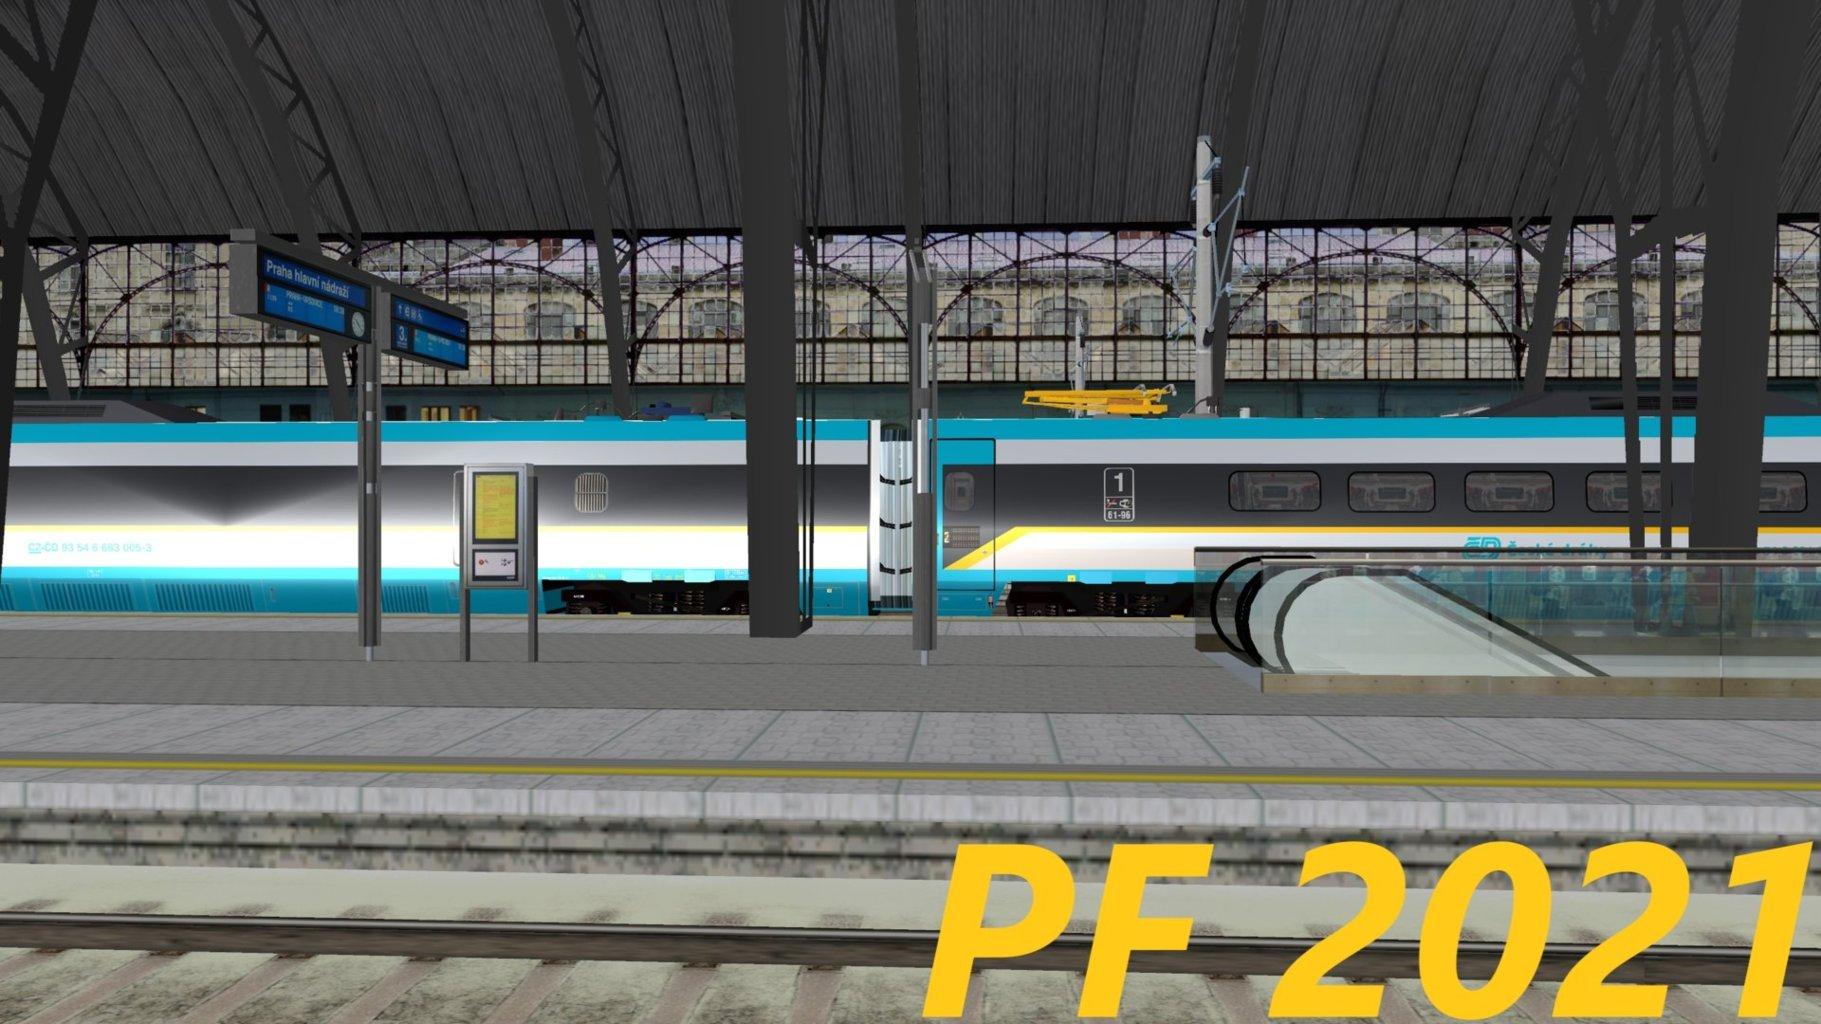 Open Rails 2020-12-25 06-31-41 - kopie.jpg